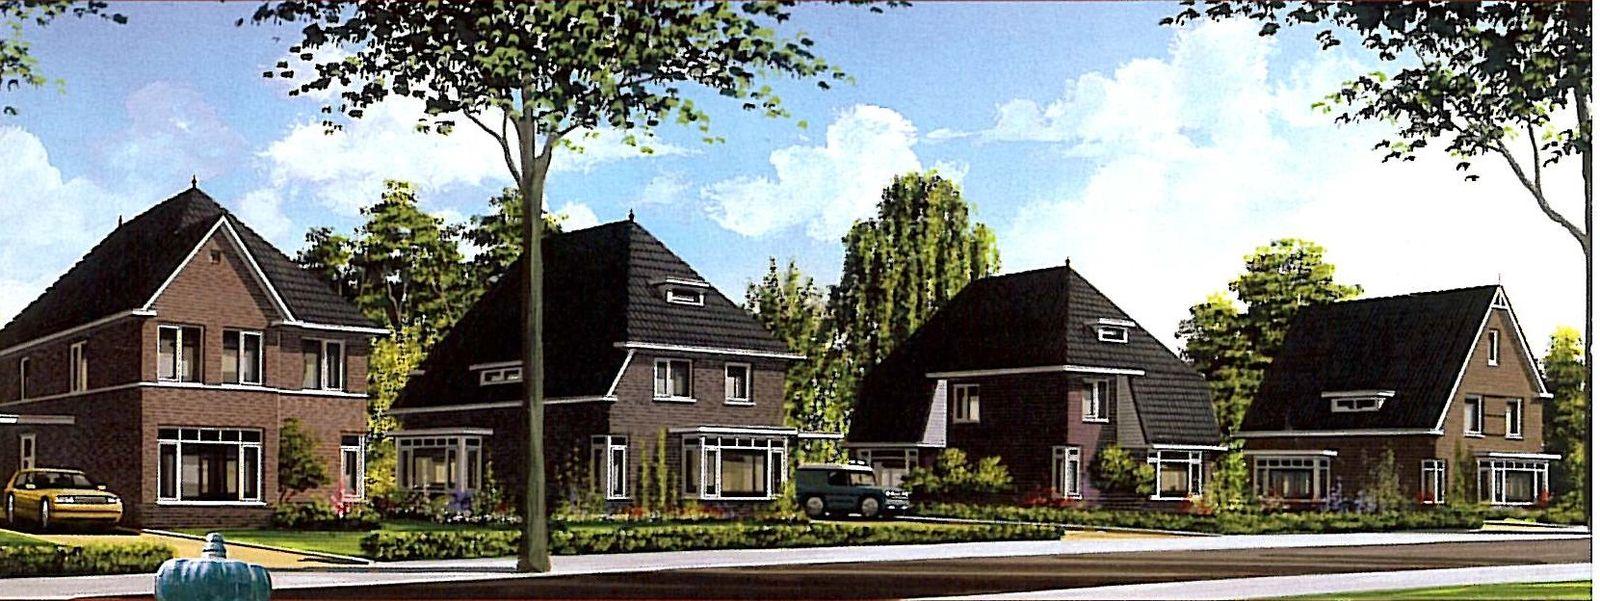 Dorpsstraat 46-a, Heino